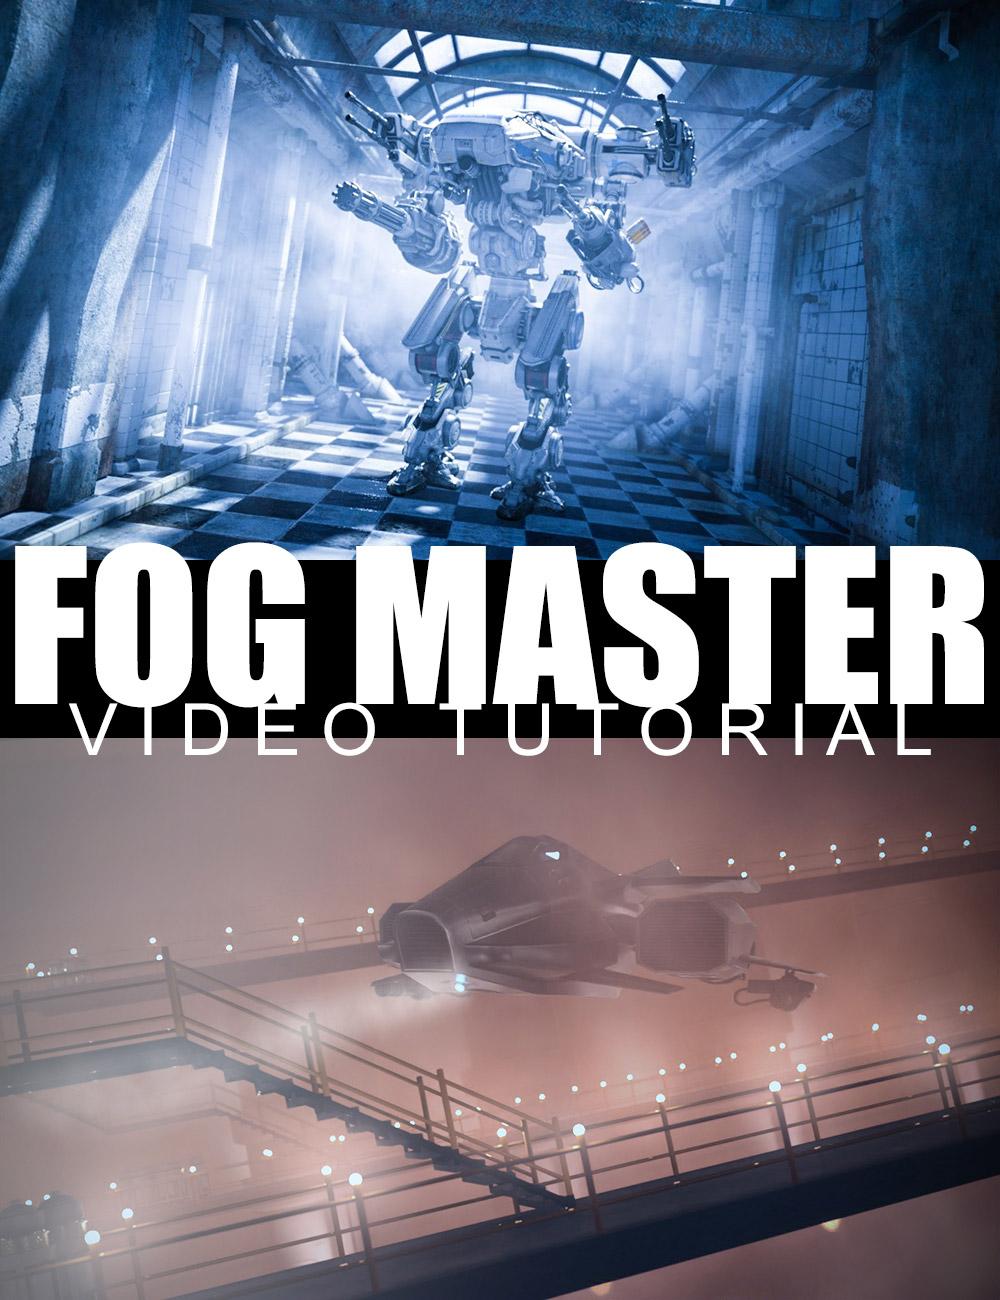 Fog Master - Video Tutorial by: Dreamlight, 3D Models by Daz 3D